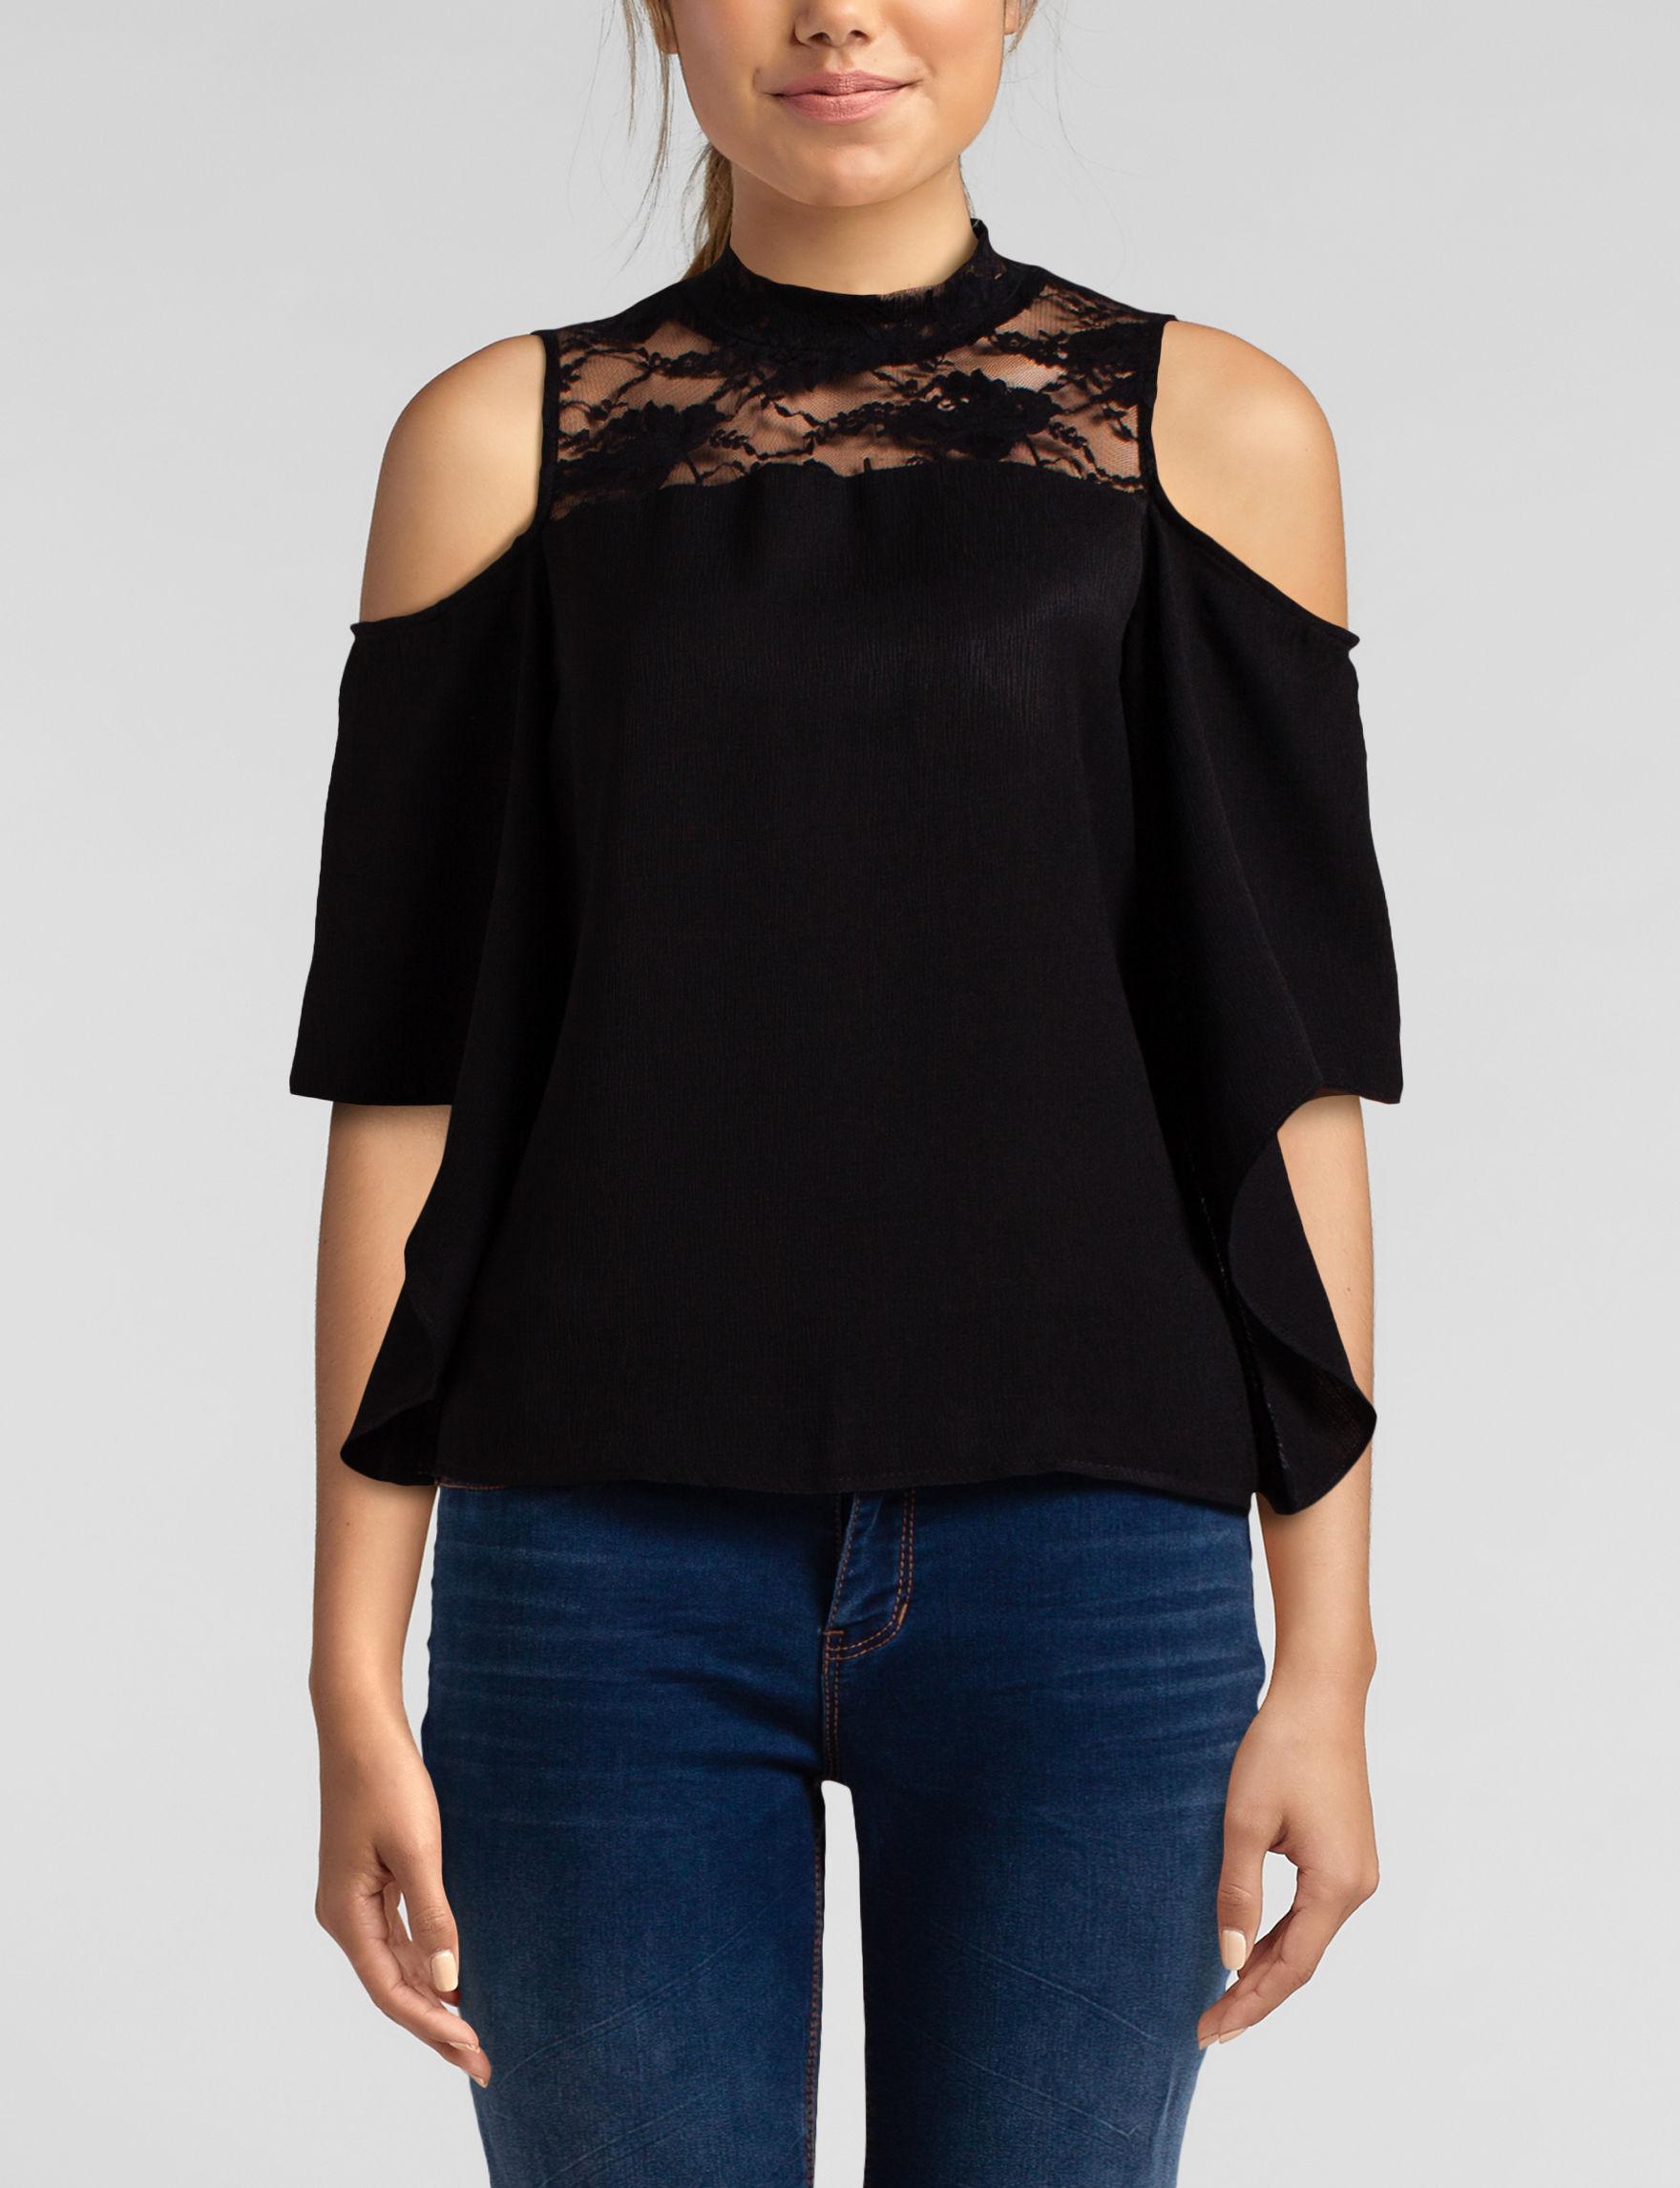 Wishful Park Black Shirts & Blouses